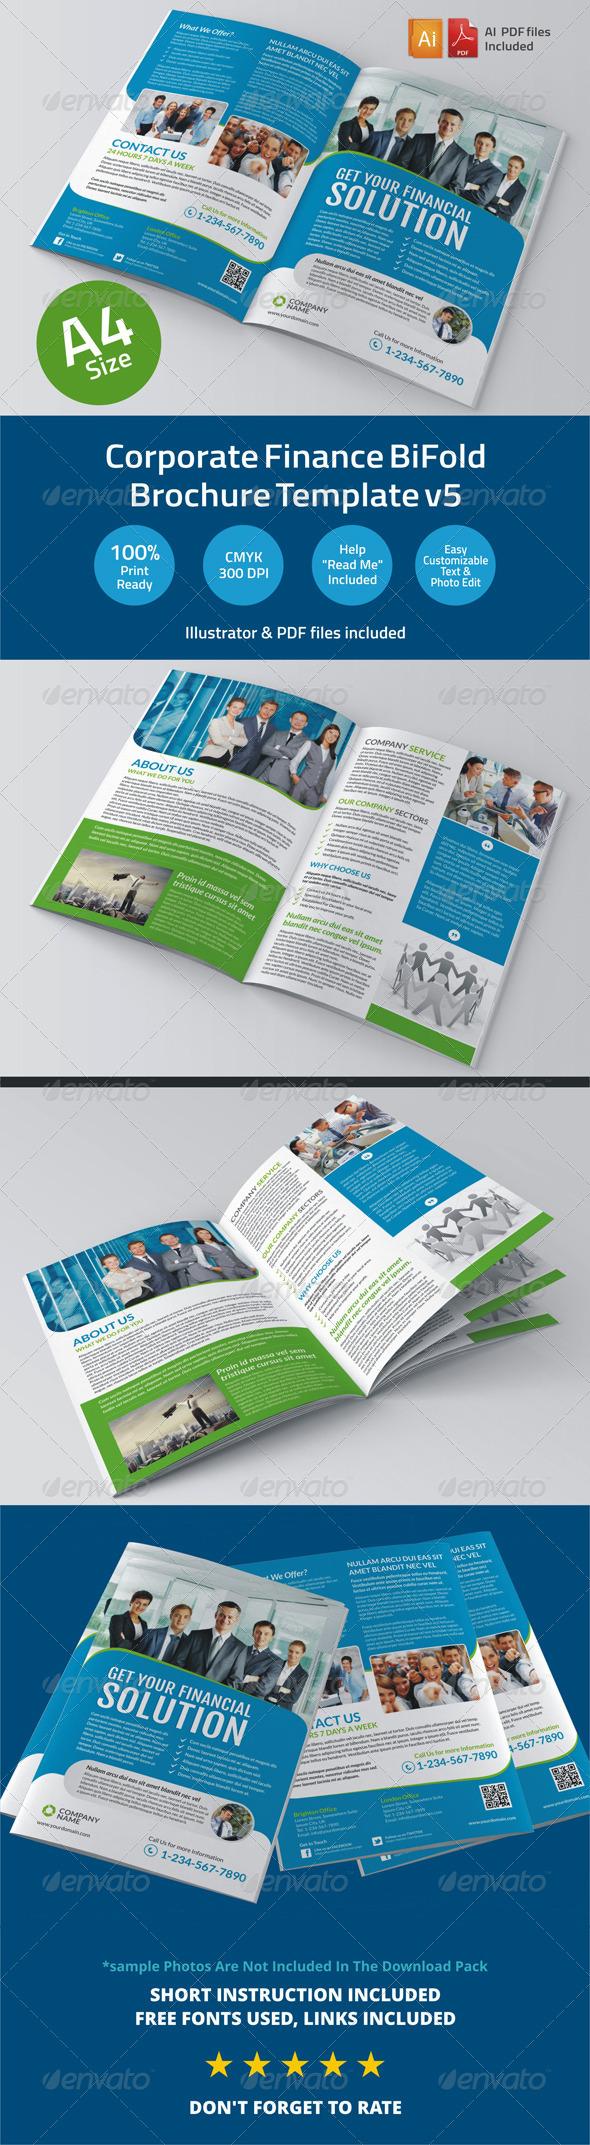 GraphicRiver Corporate Finance BiFold Brochure Template v5 6345849